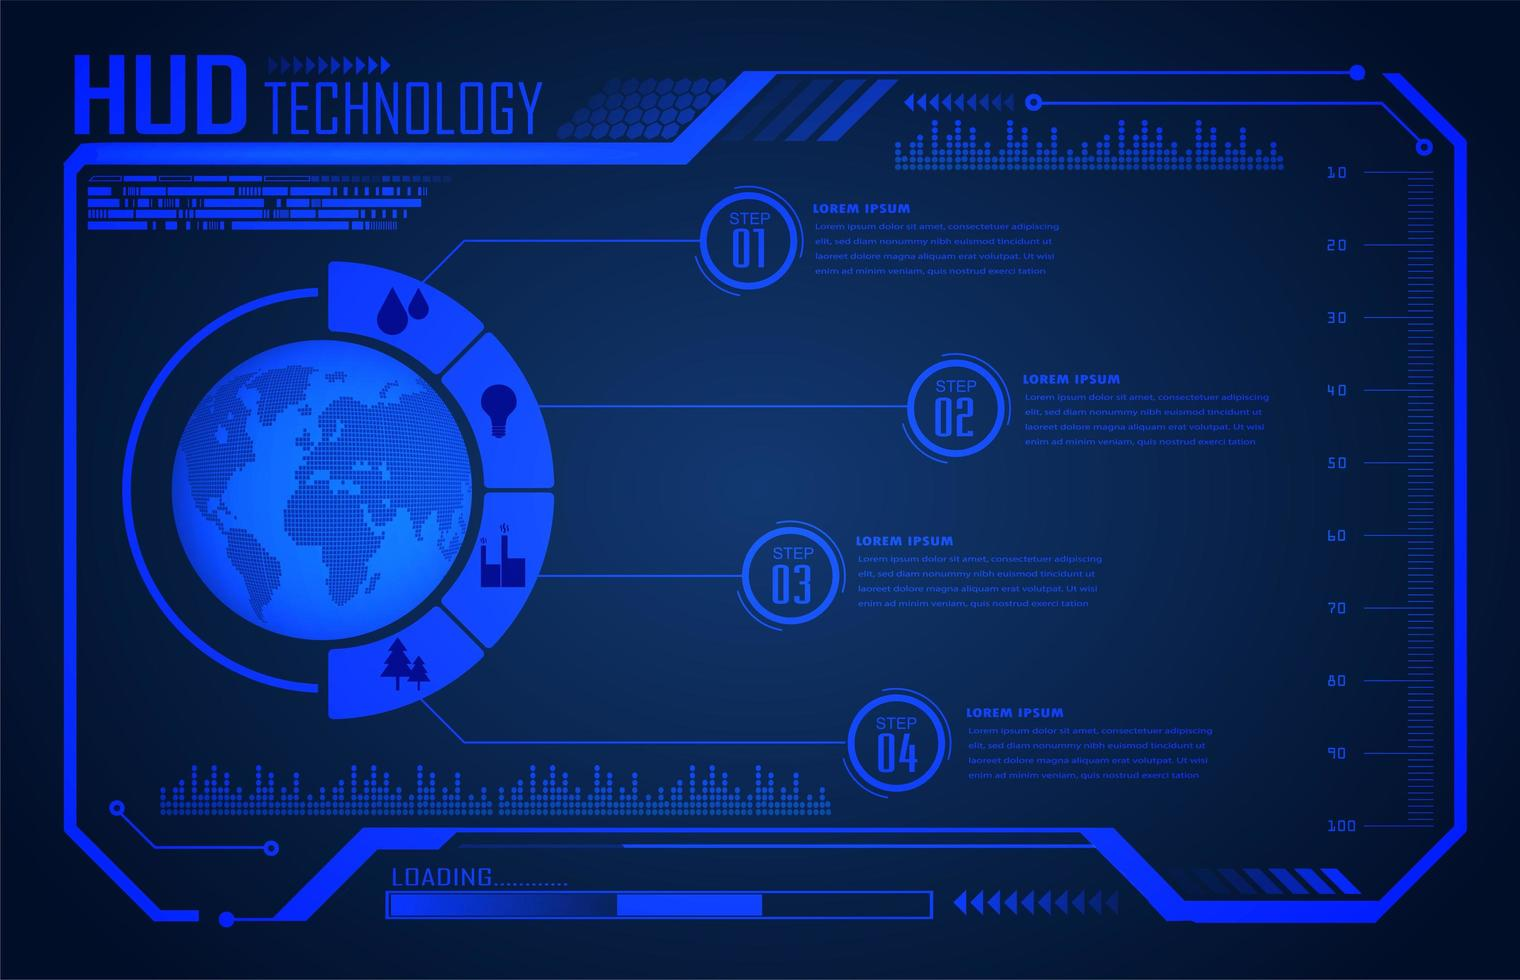 Binärplatine Zukunftstechnologie Blue World Hud vektor